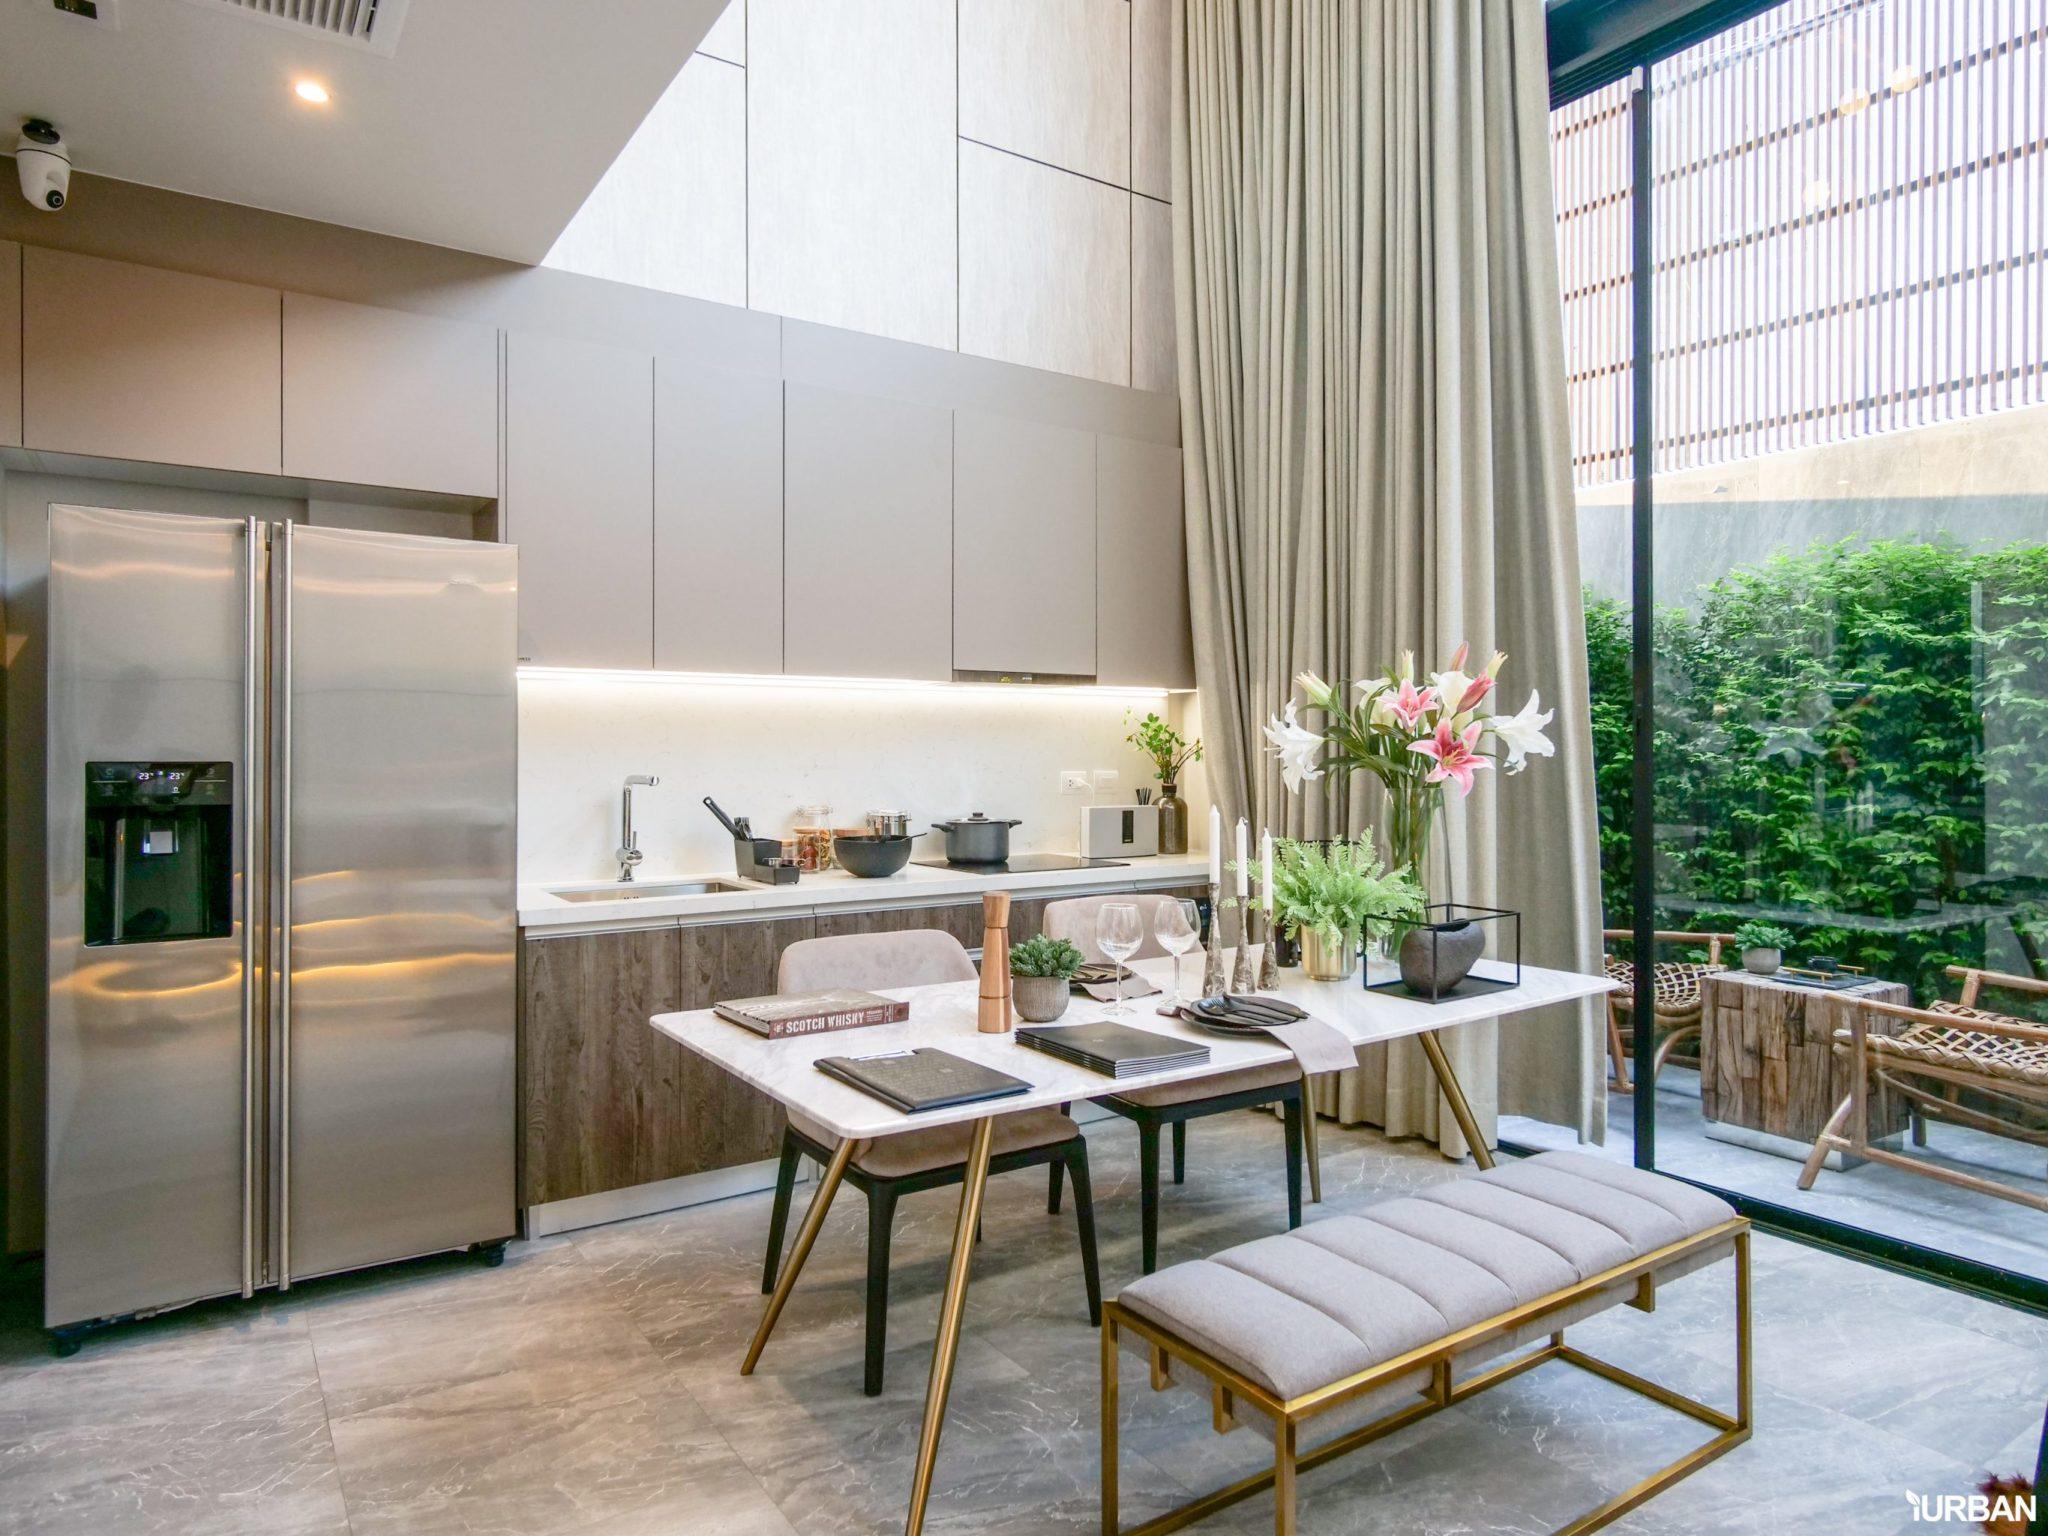 AIRES RAMA9 รีวิว Luxury Townhome 3.5 ชั้น + Rooftop ออกแบบสวย ย่านพระราม9 (ใกล้ รพ.สมิติเวช) 27 - AIRES